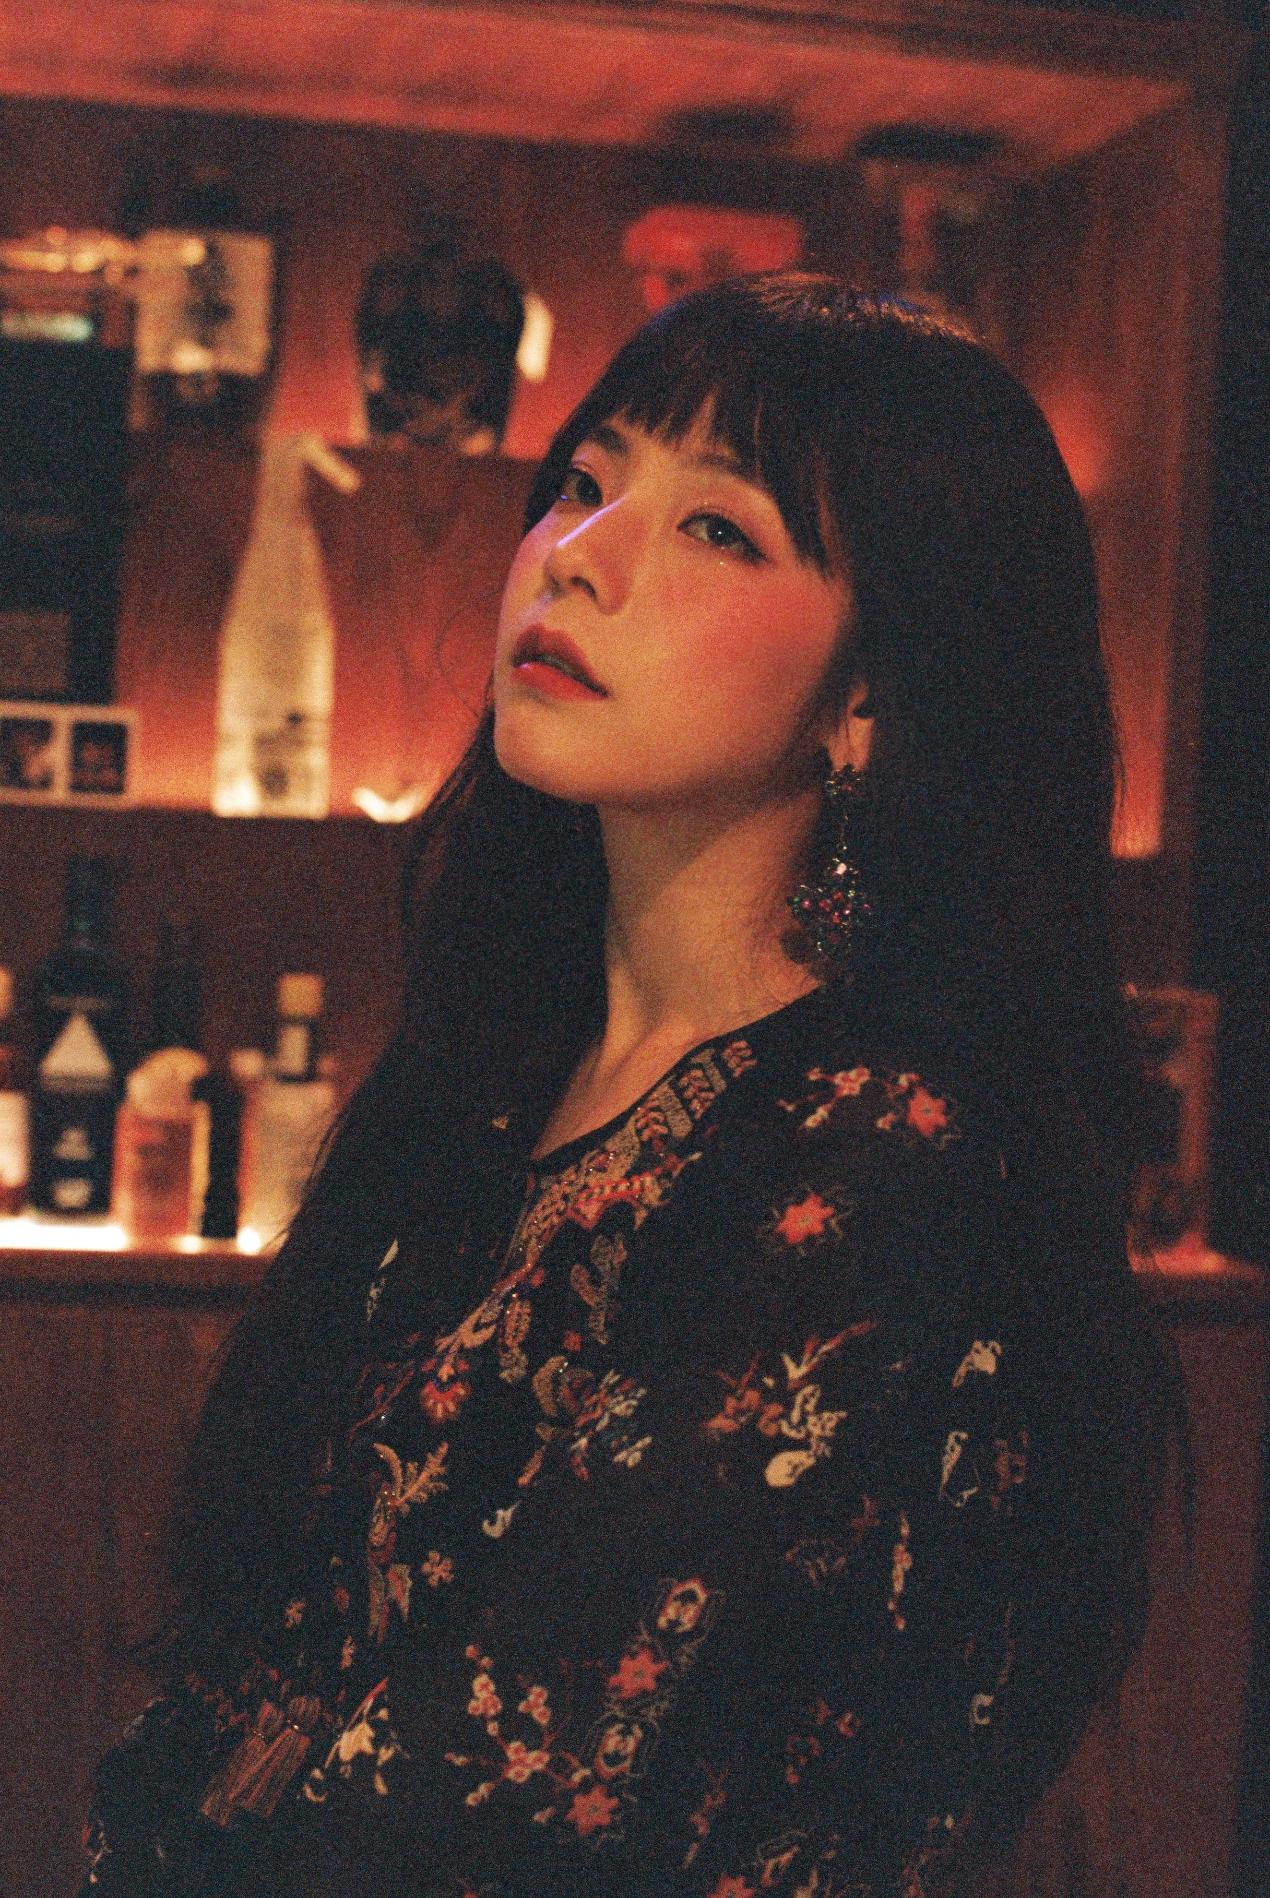 Lee jonghyun and juniel dating